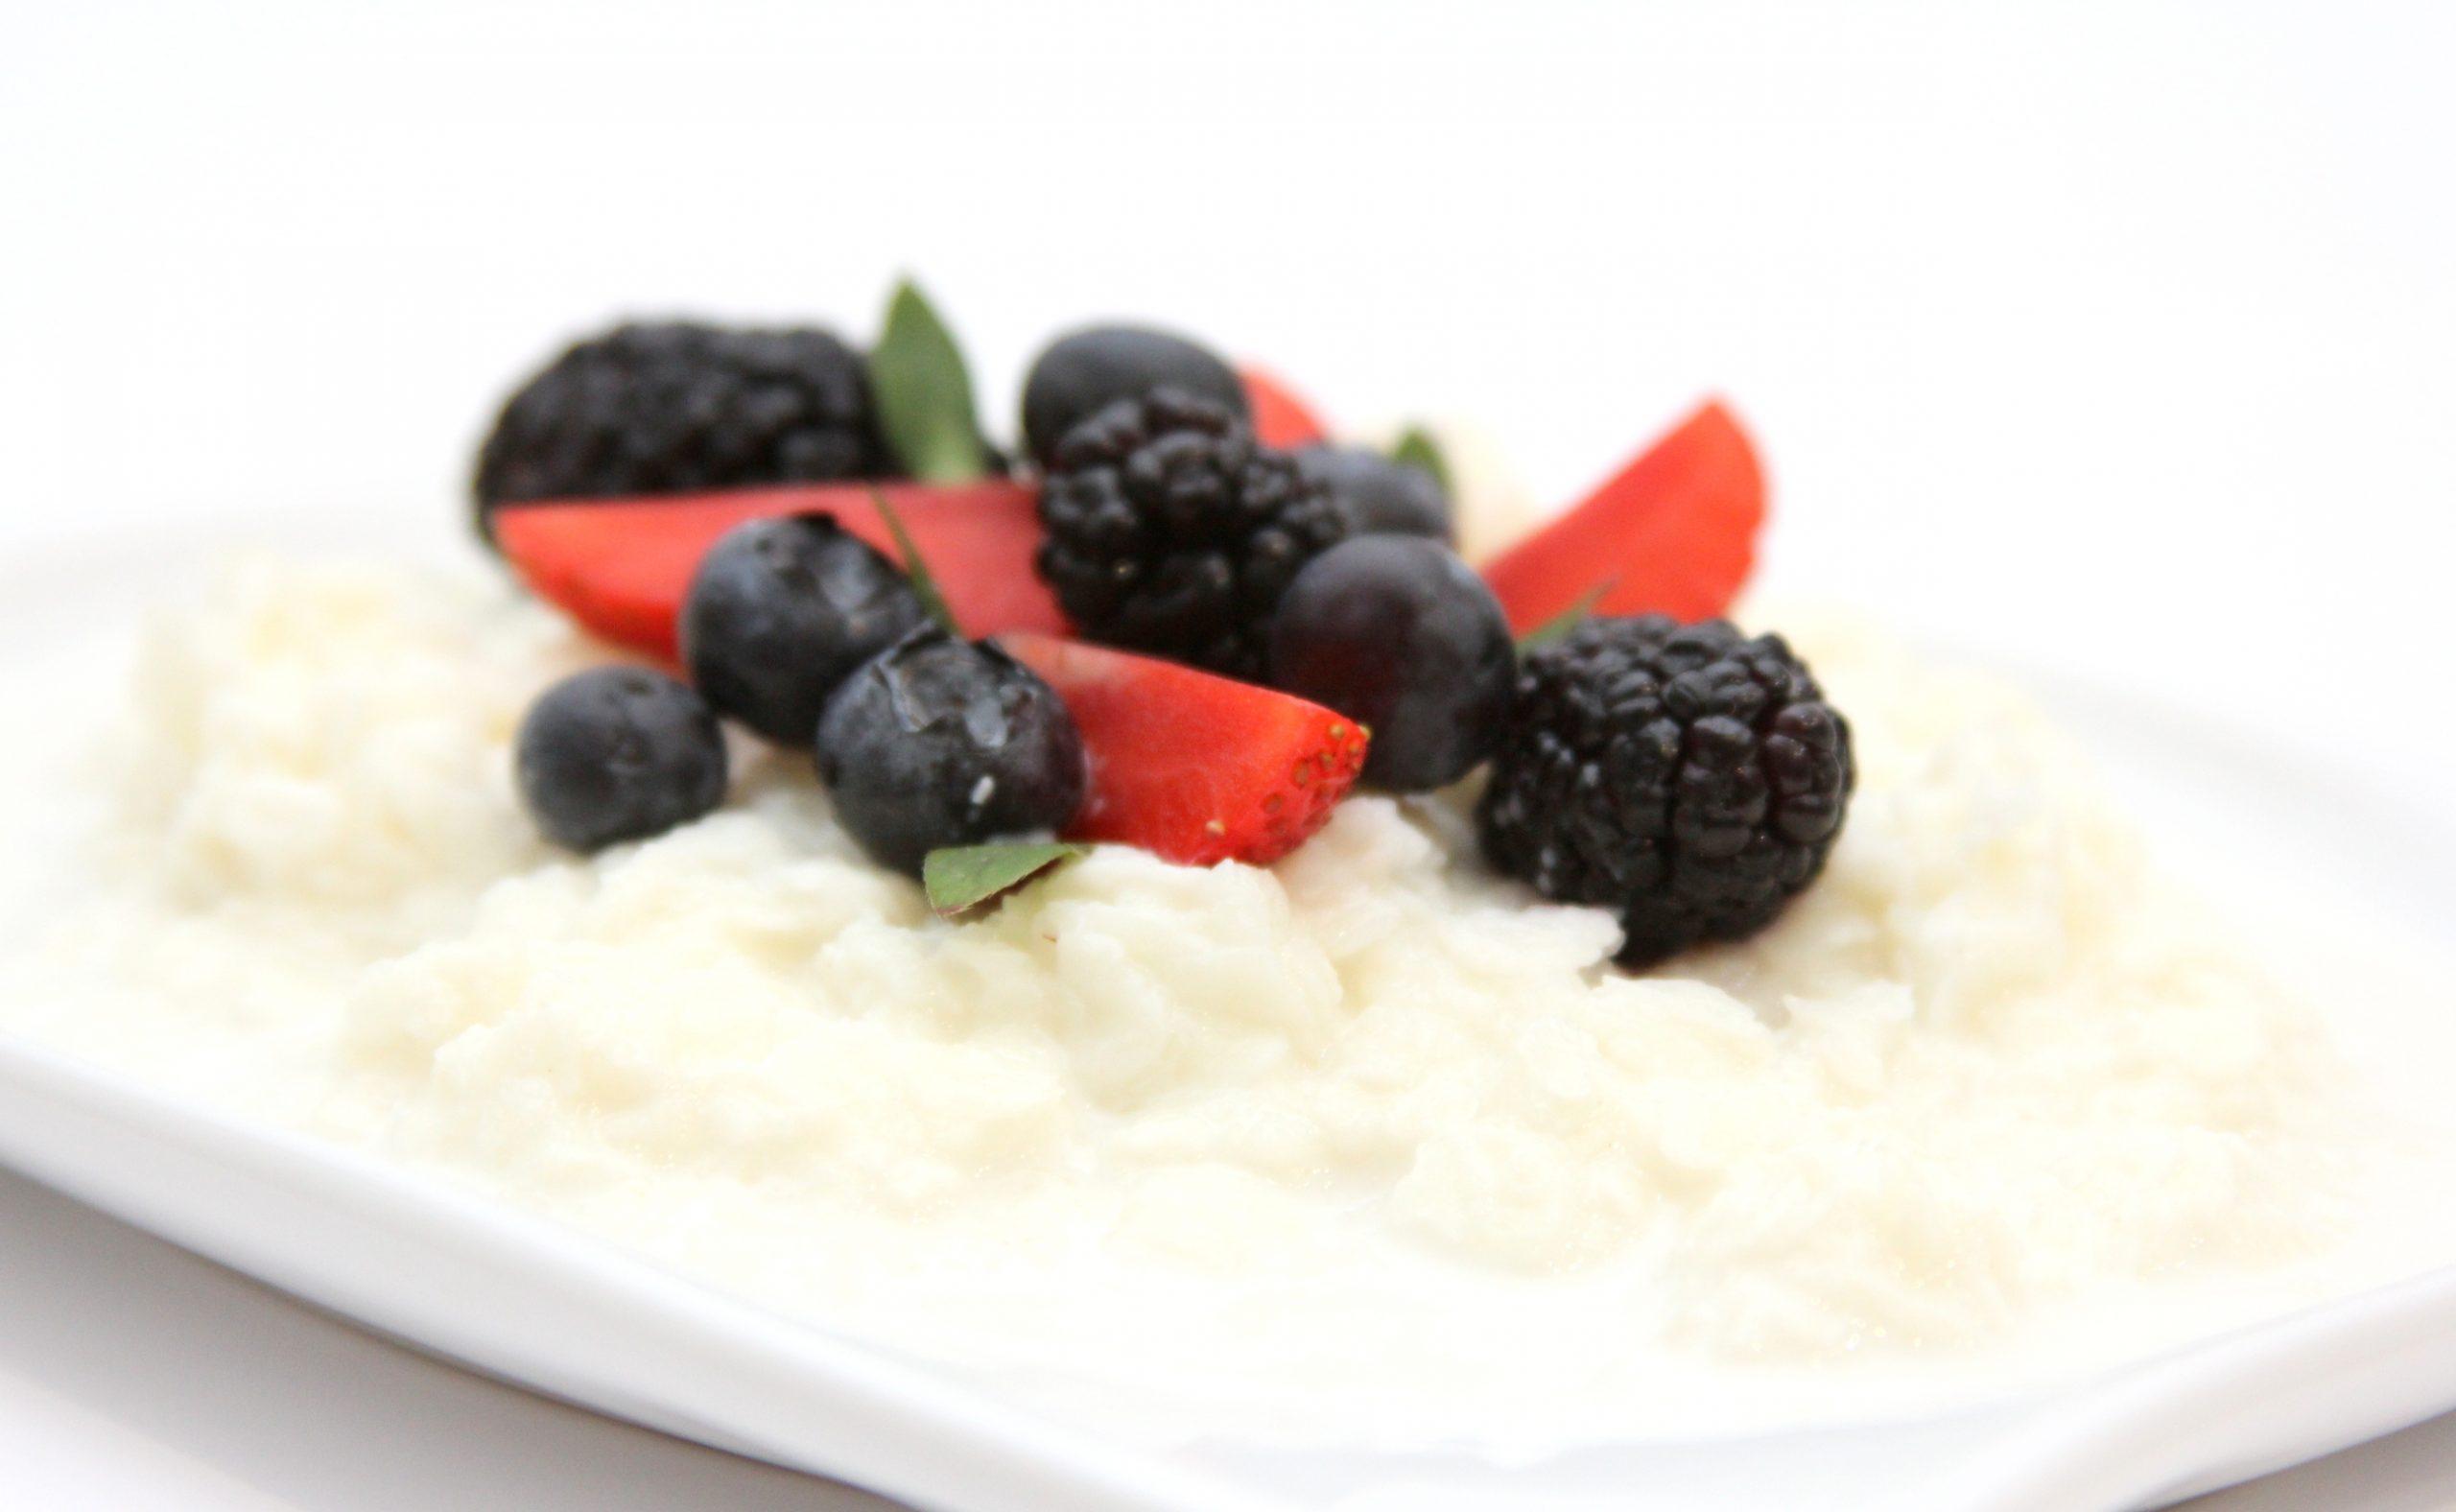 Mliečna ryžová kaša z ryžových vločiek